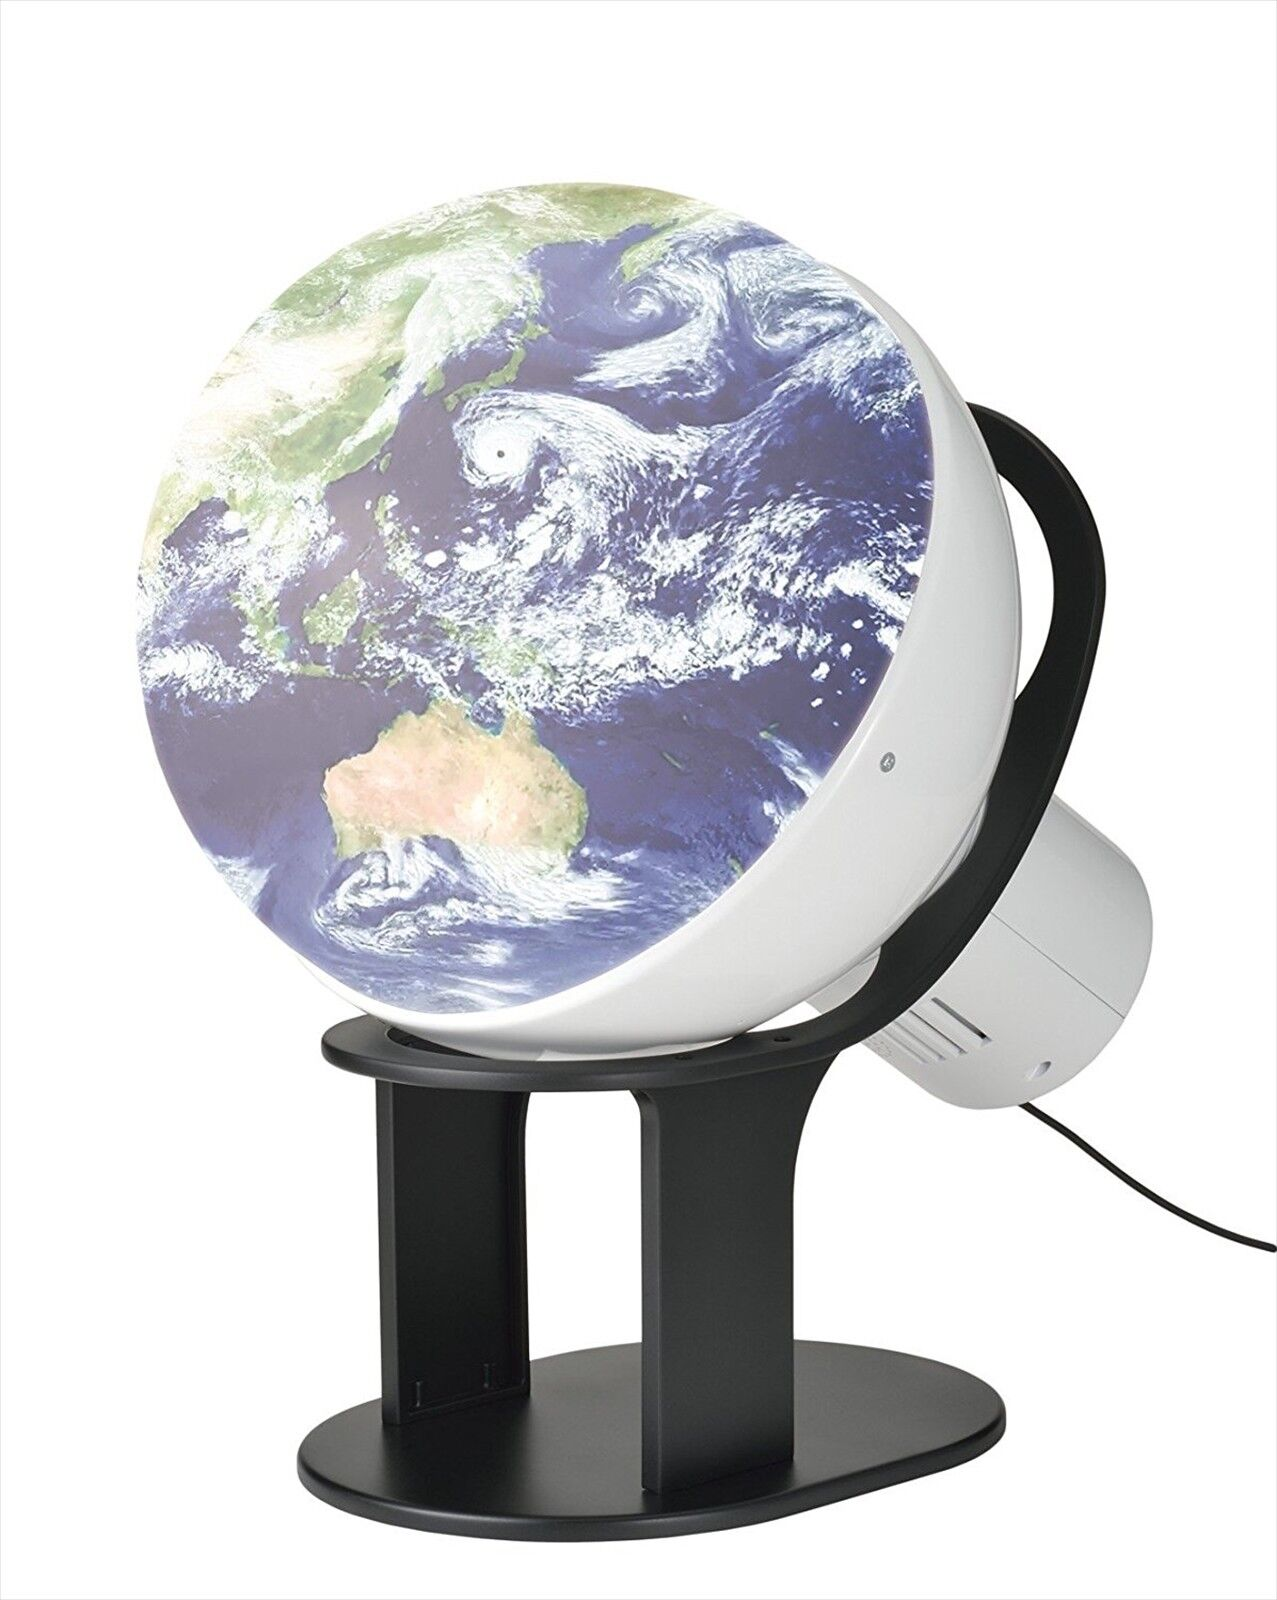 Globo Digital Aqualium Stars Gakken Mundo Ojo Proyector de envío acelerado